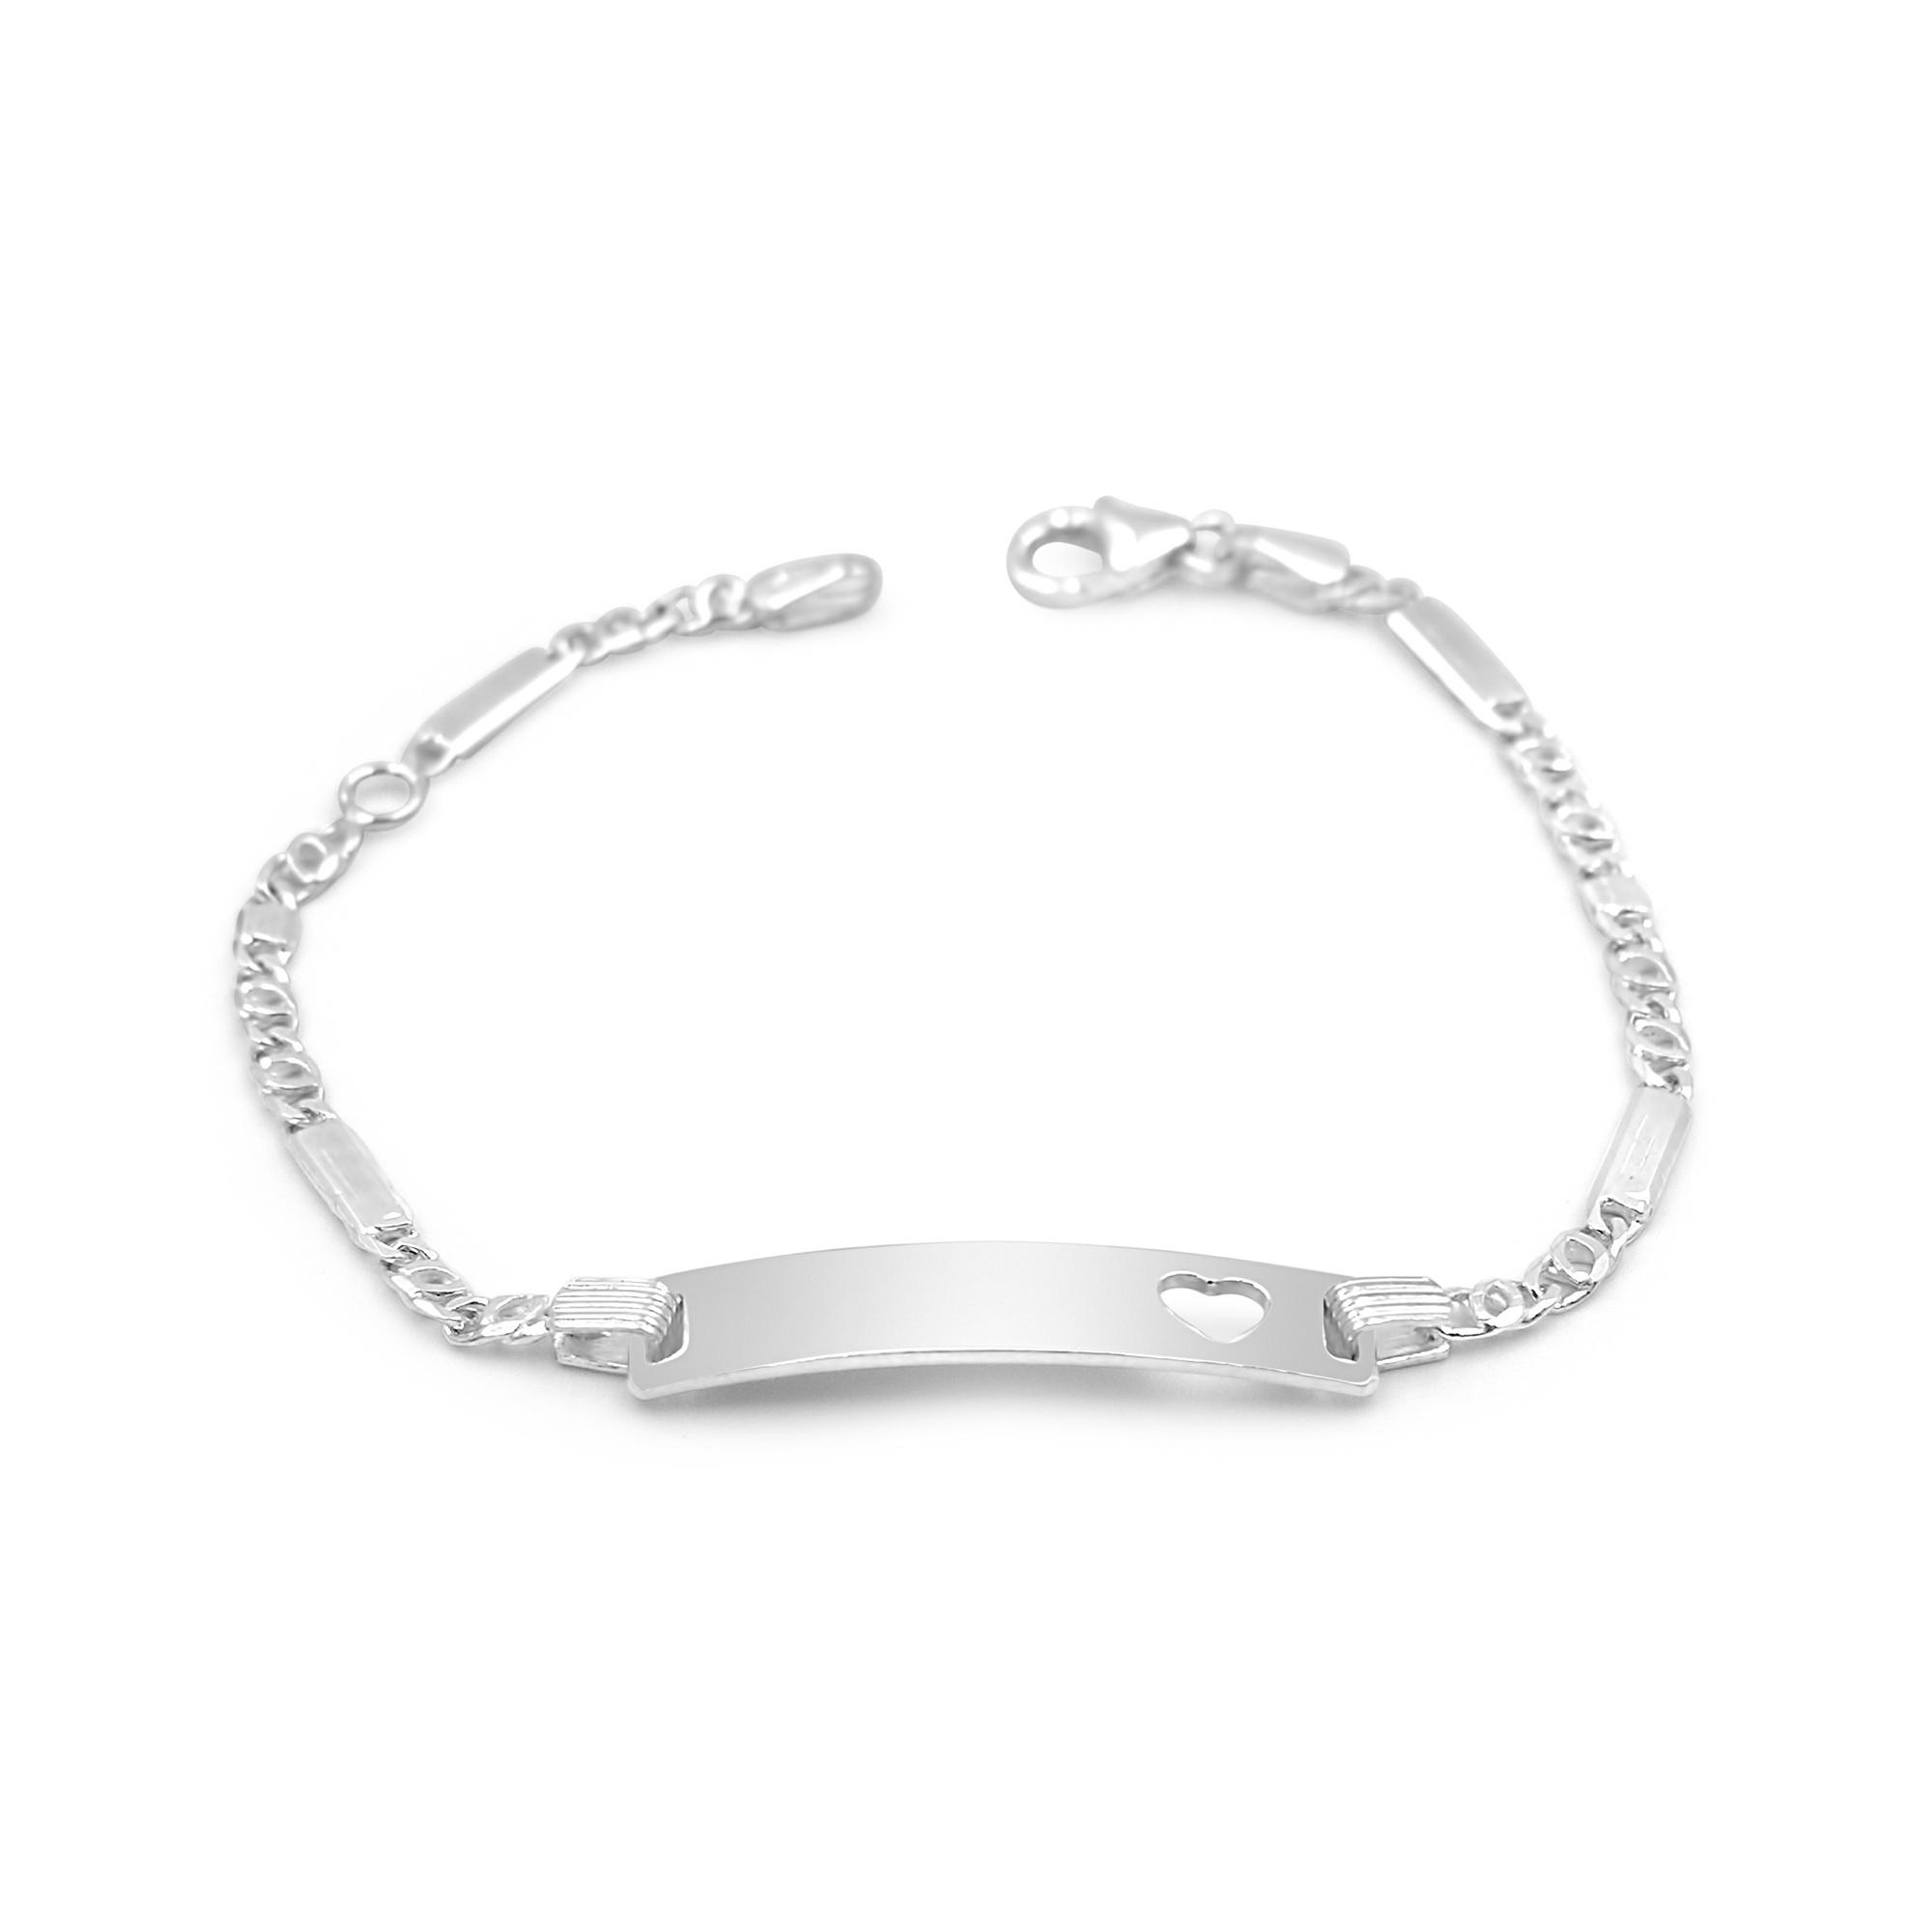 Silver baby bracelet